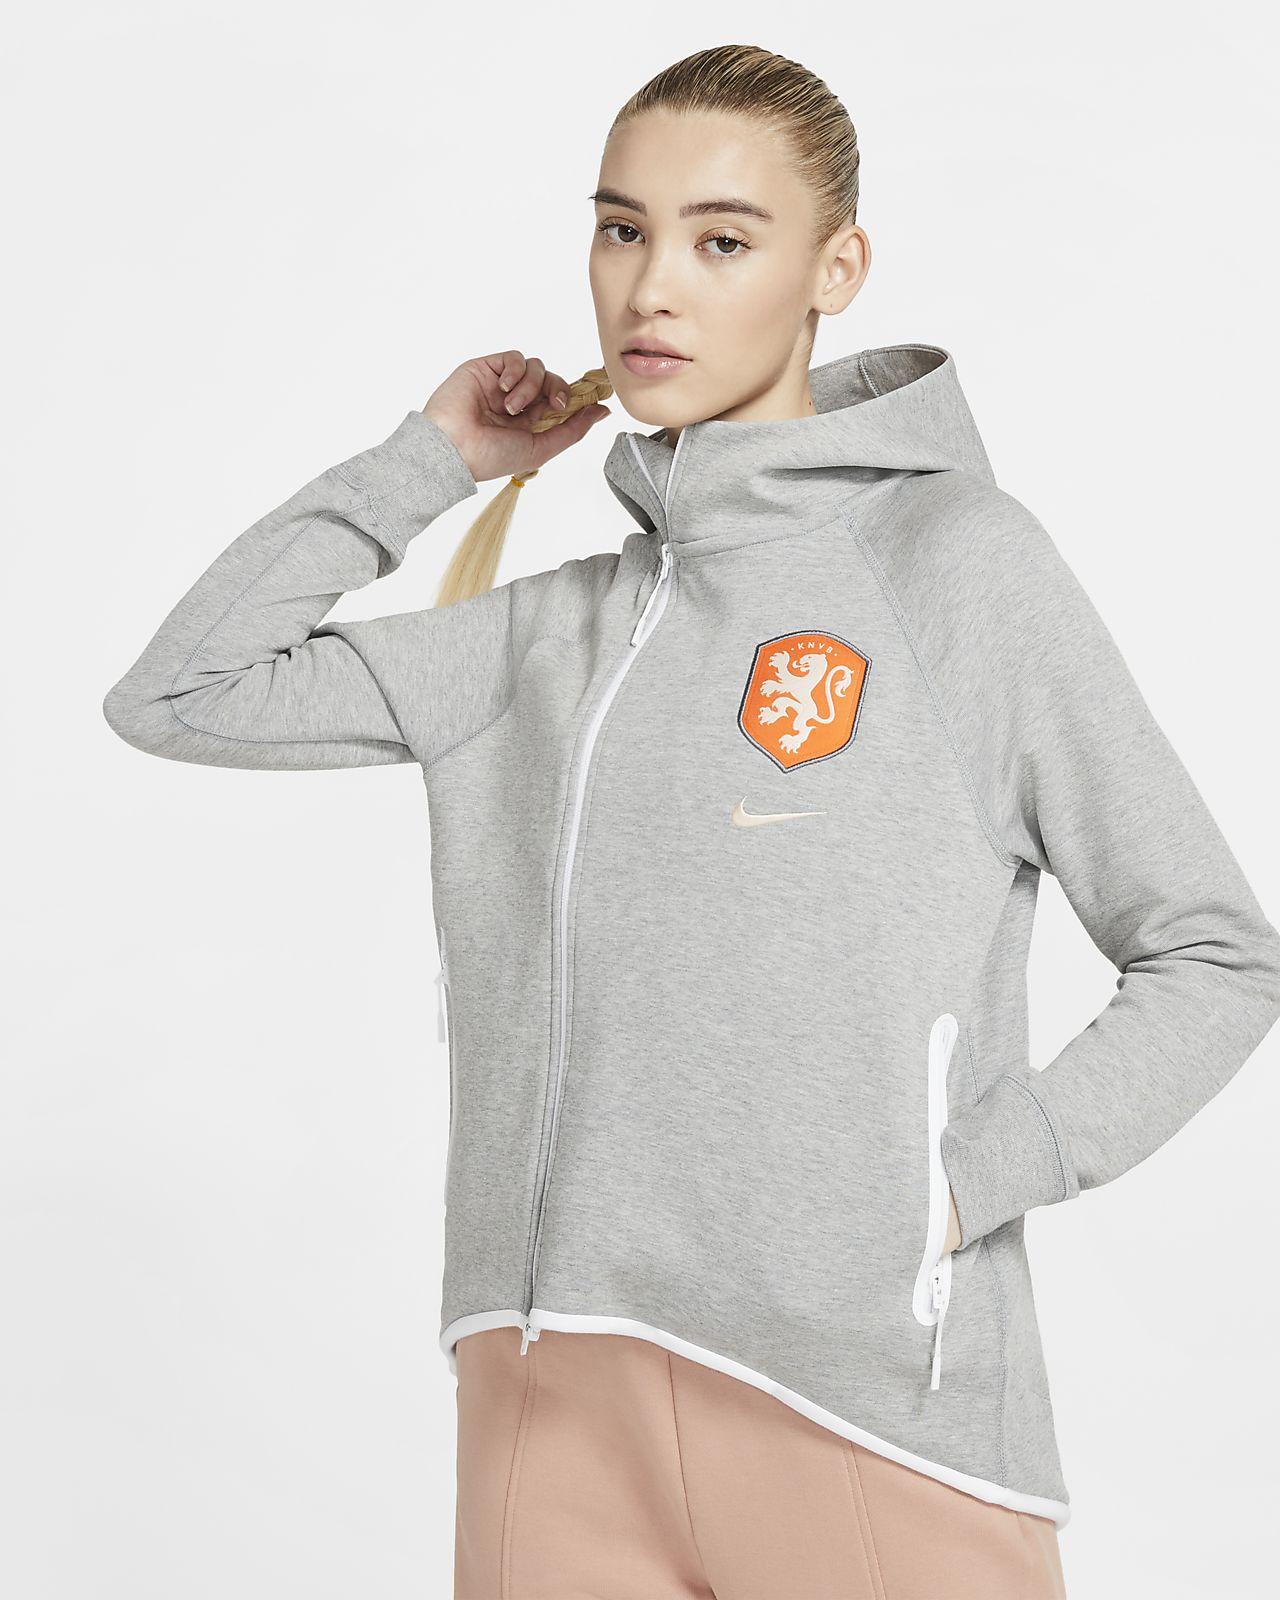 Niederlande Tech Fleece Damen-Fußballponcho